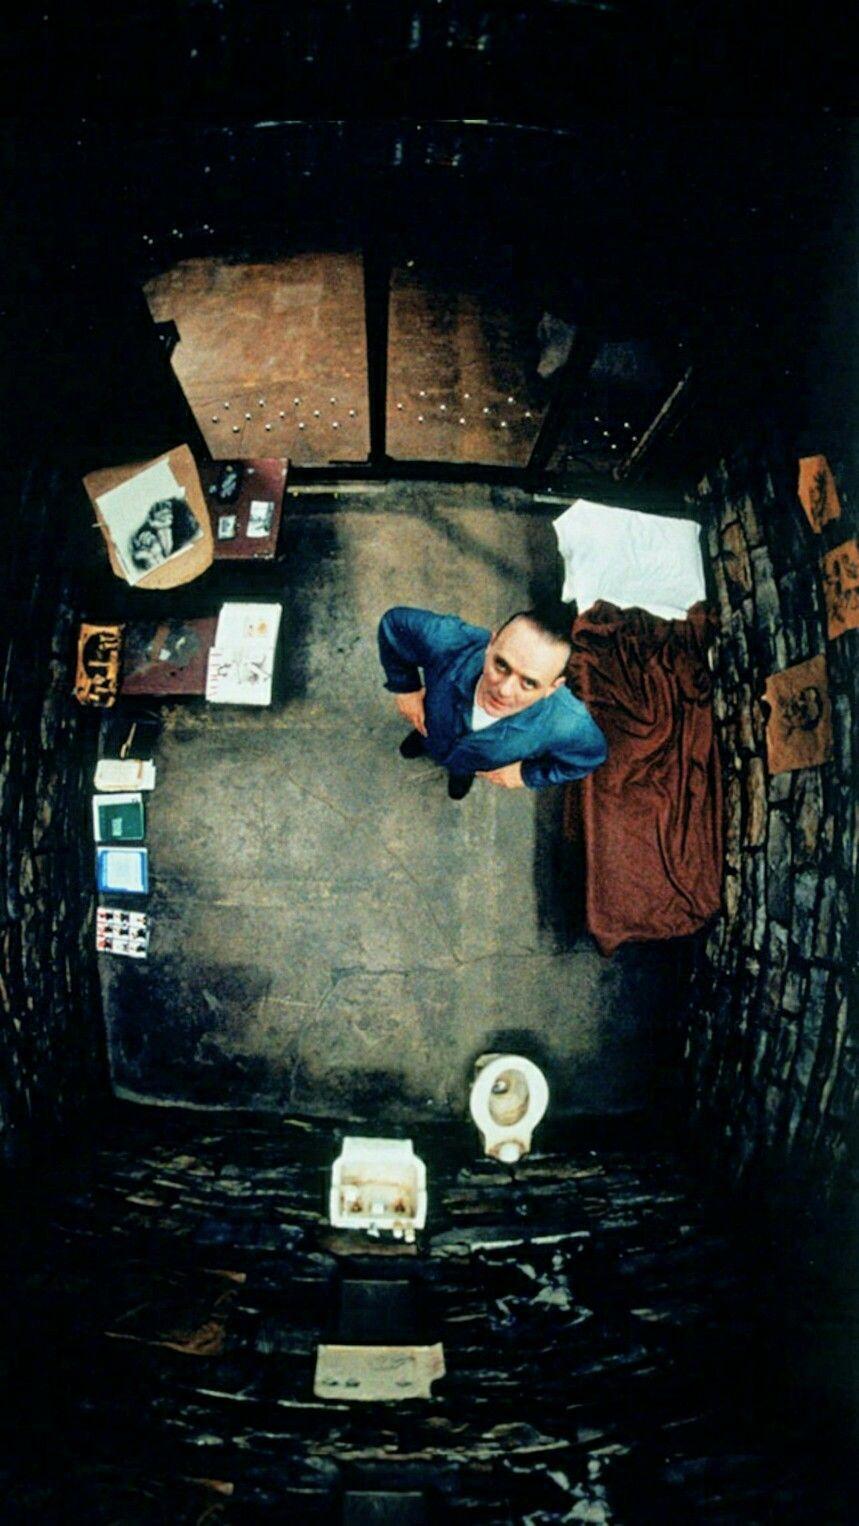 Hannibal Lecter Wallpapers - Wallpaper Cave